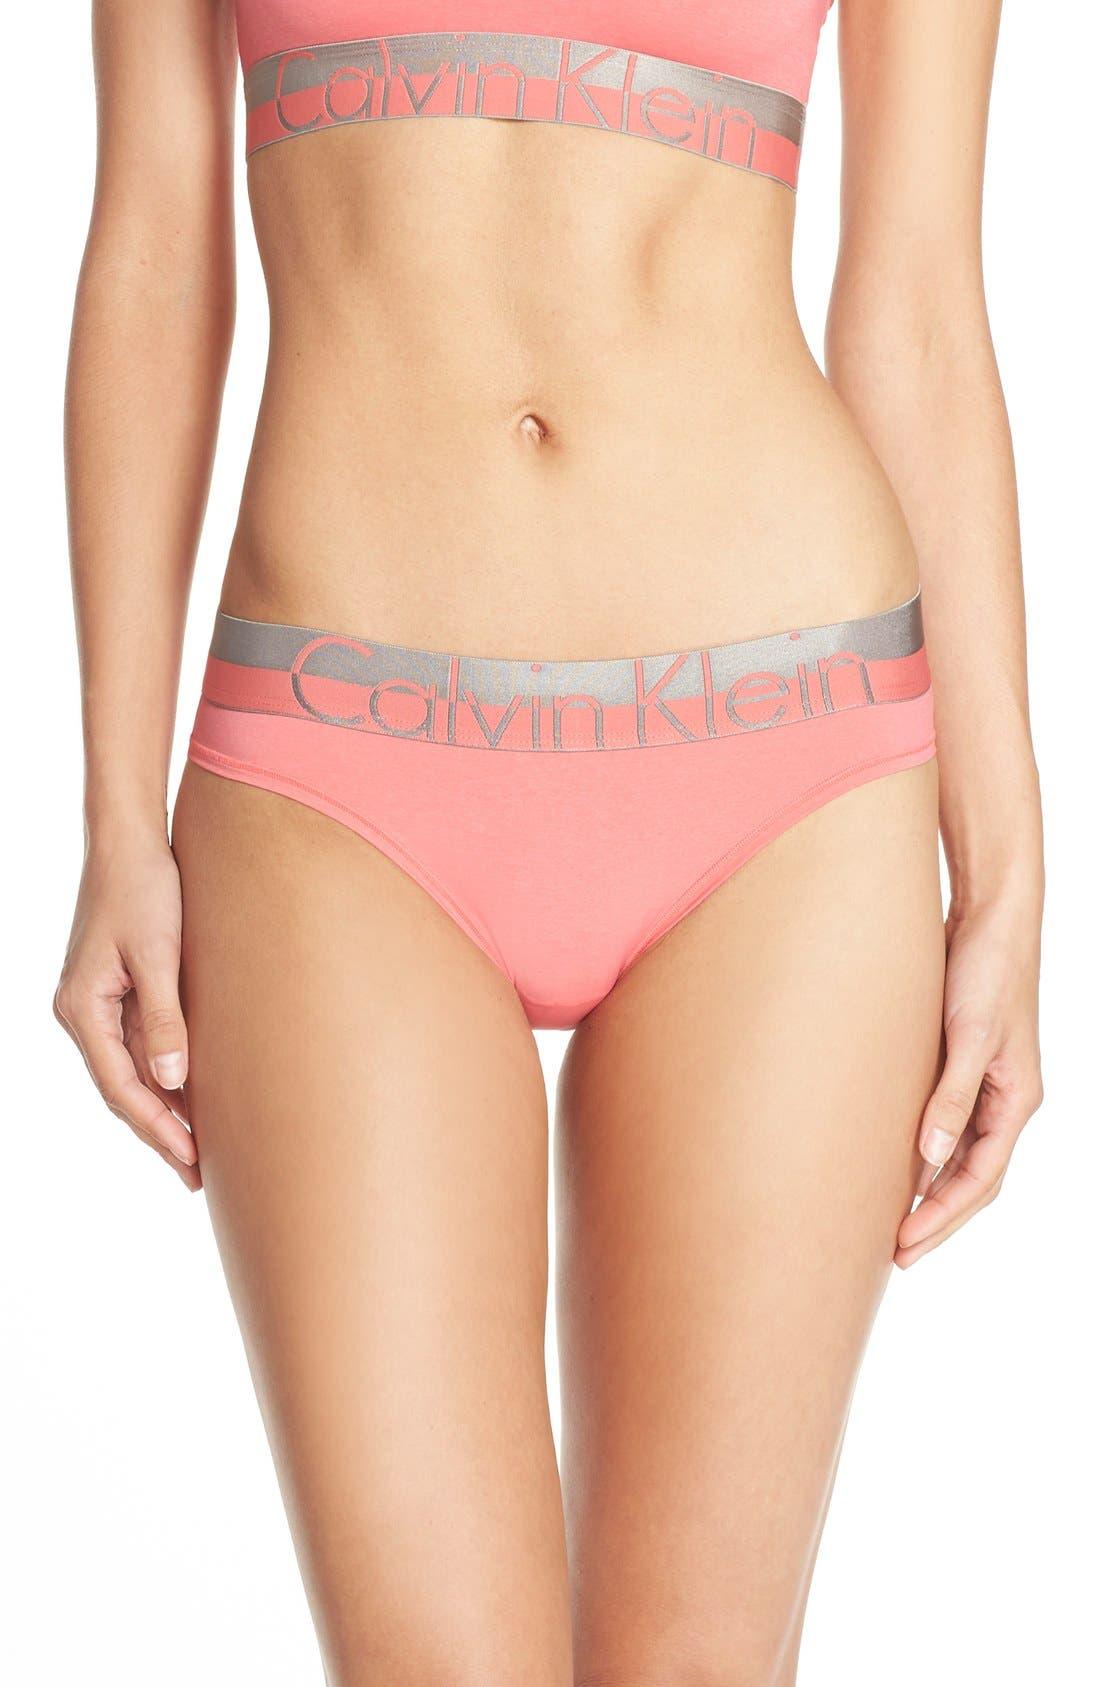 Main Image - Calvin Klein 'Magnetic Force' Microfiber Bikini Briefs